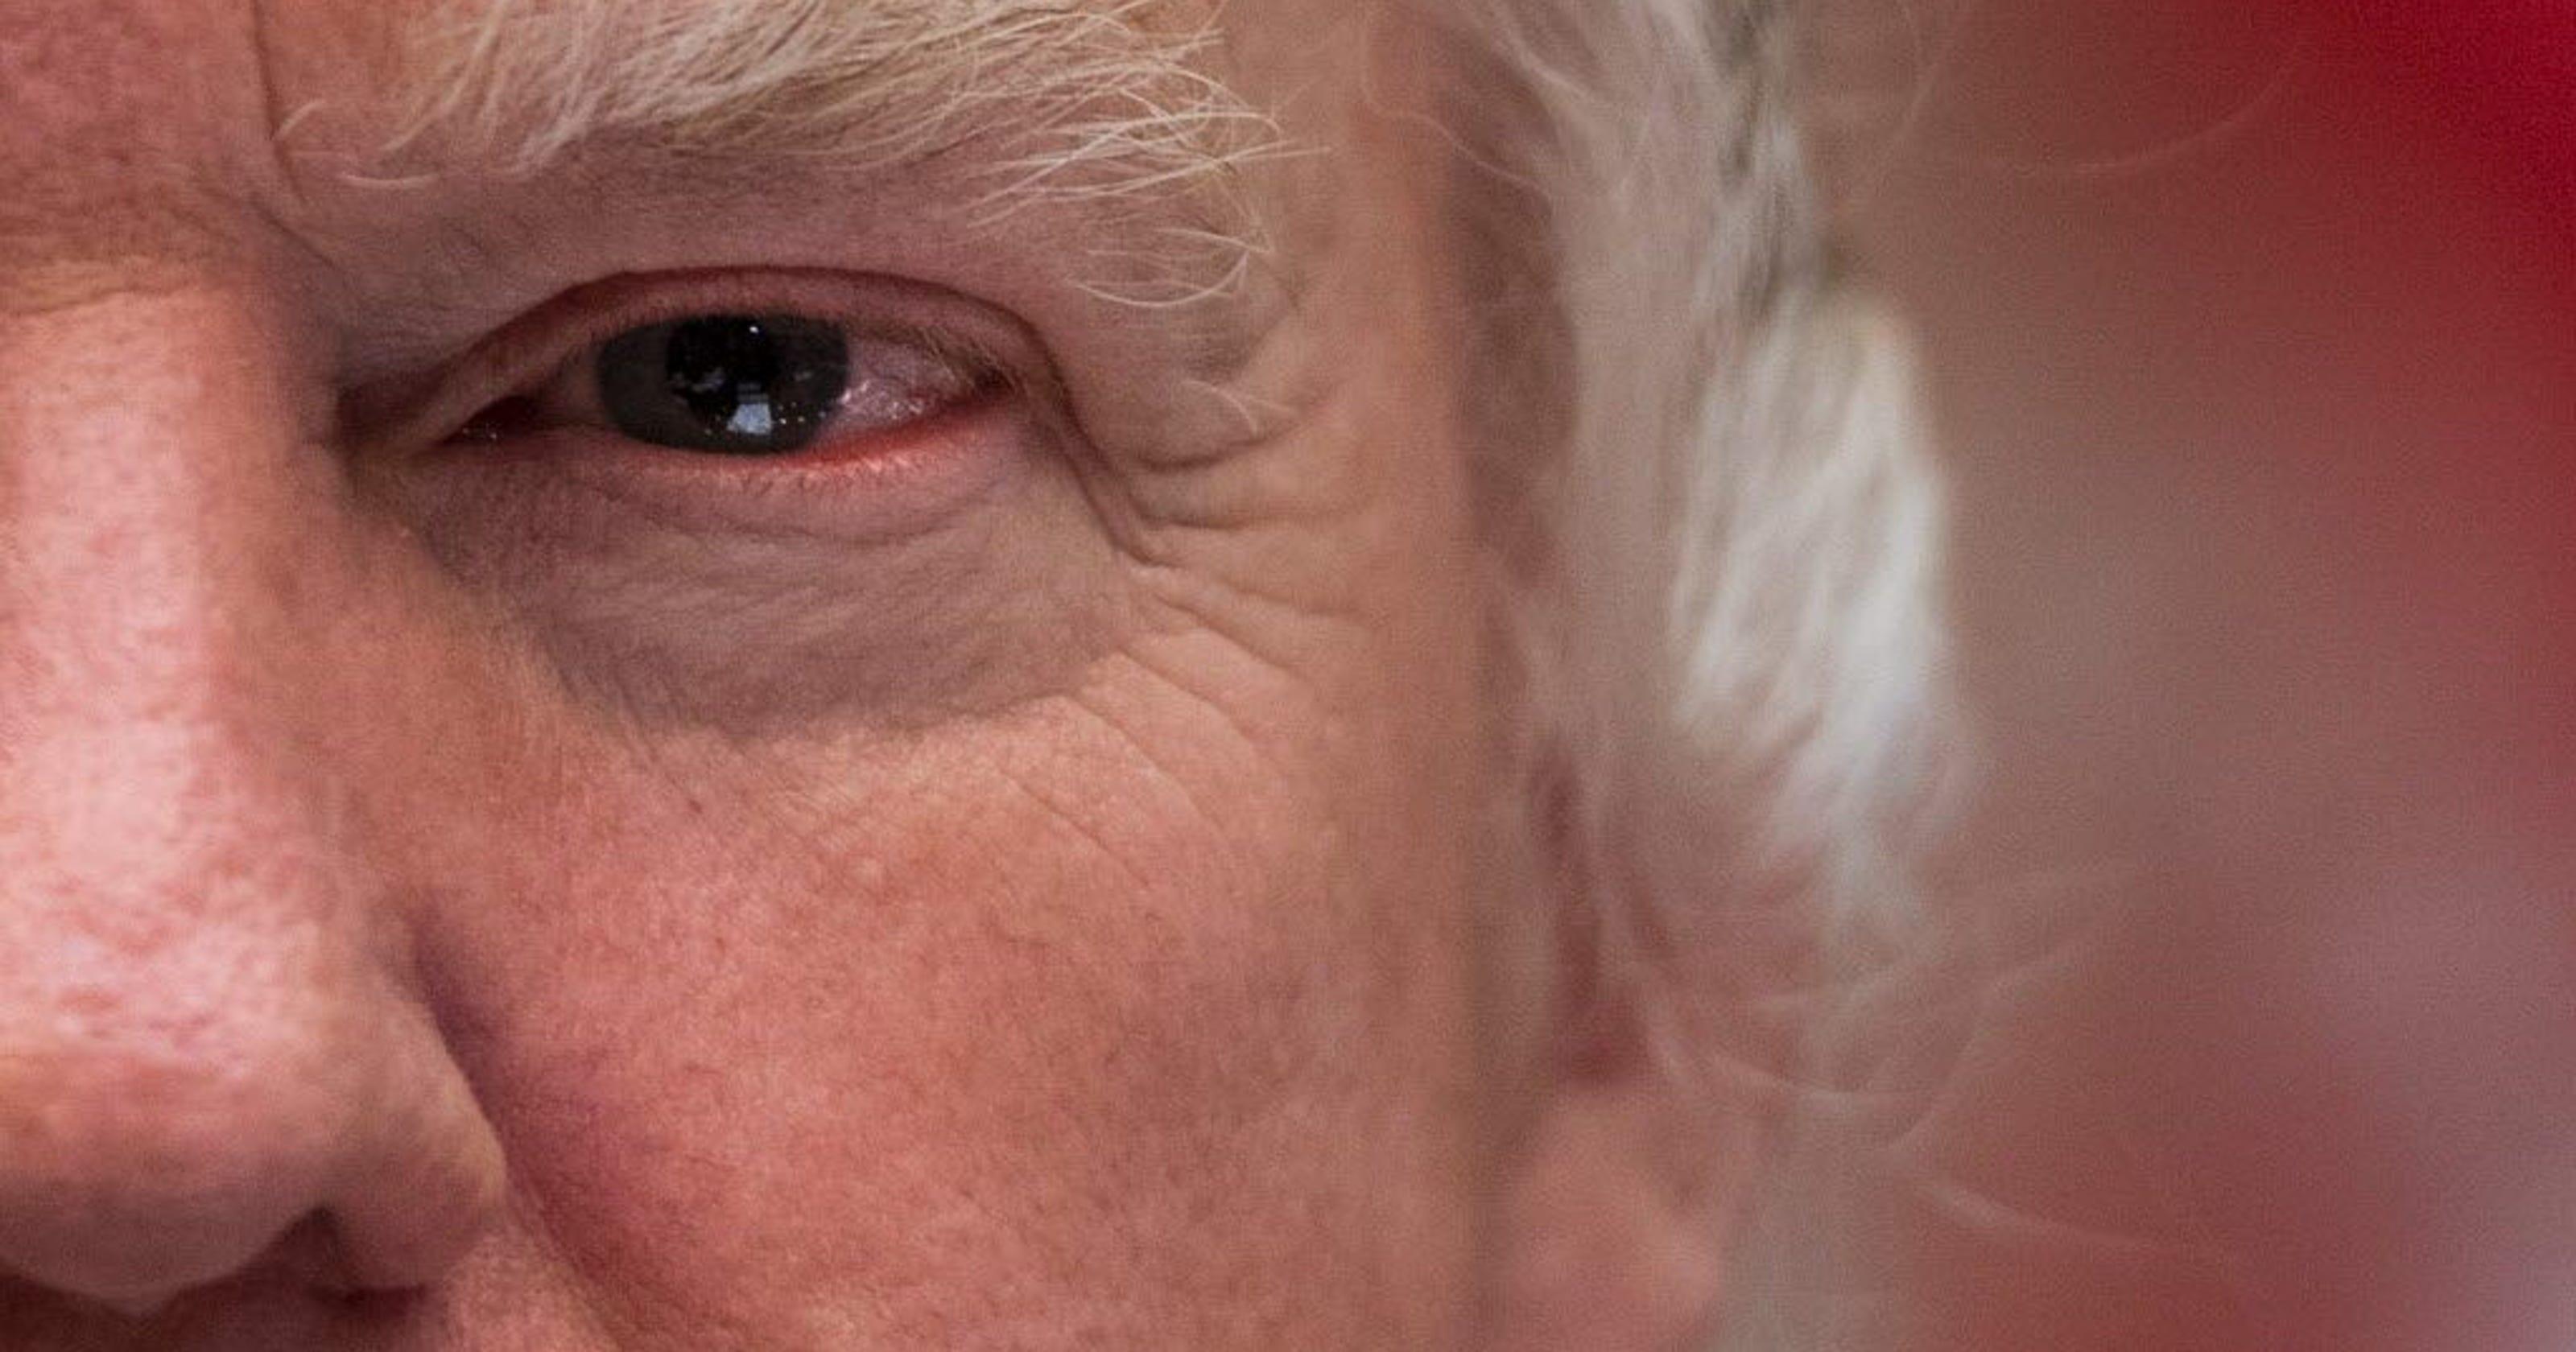 Donald Trump's malignant narcissism is toxic: Psychologist